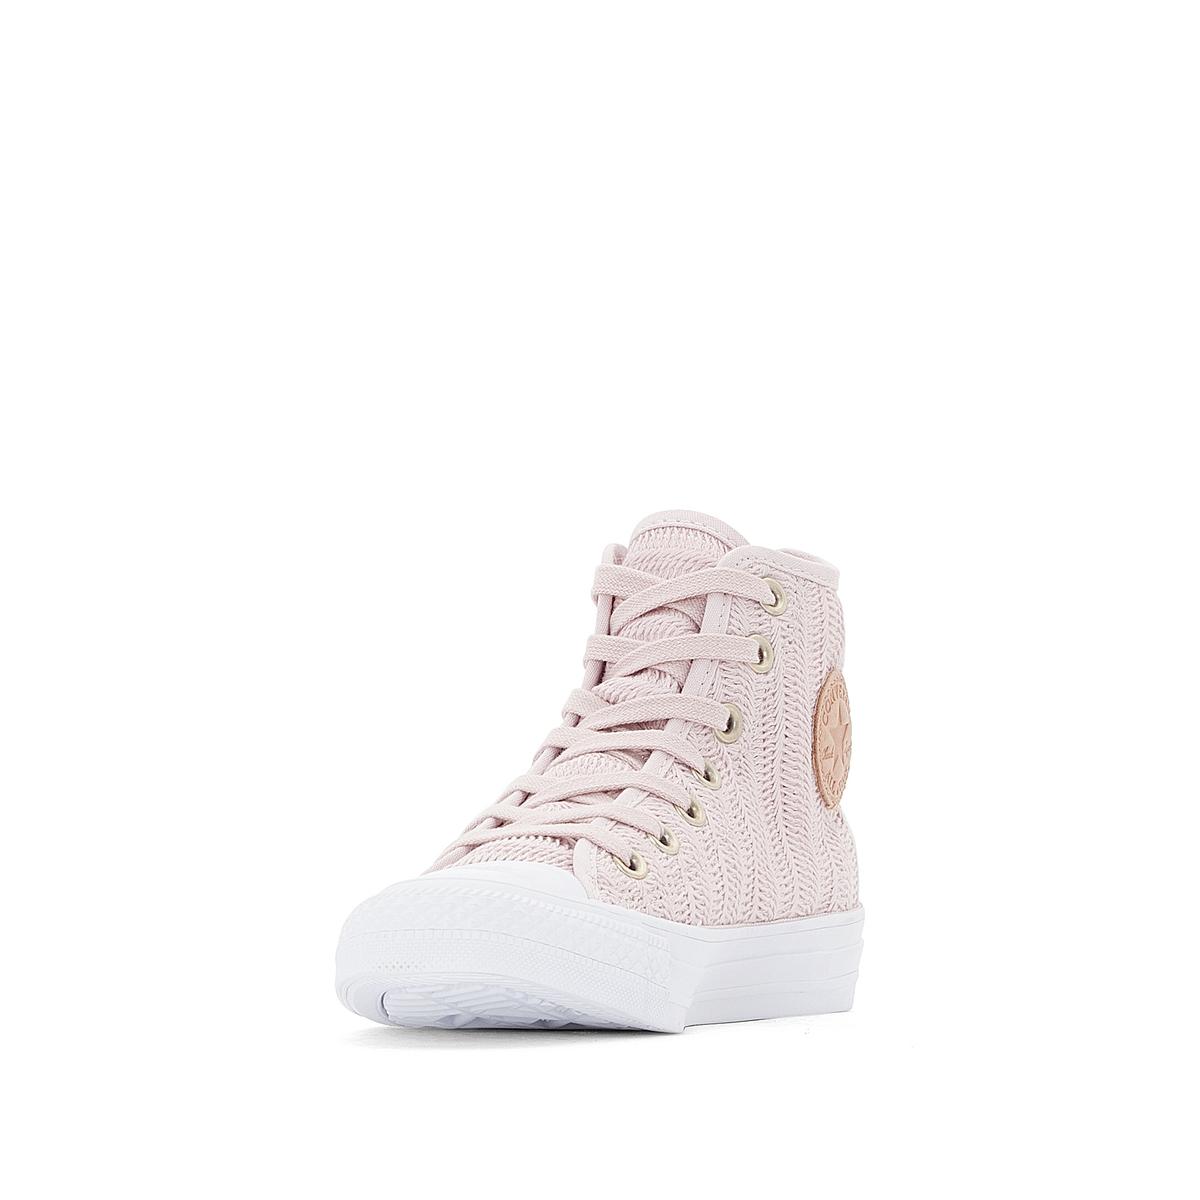 Imagen secundaria de producto de Zapatillas de caña alta CTAS HI HERRINGBONE MESH - Converse